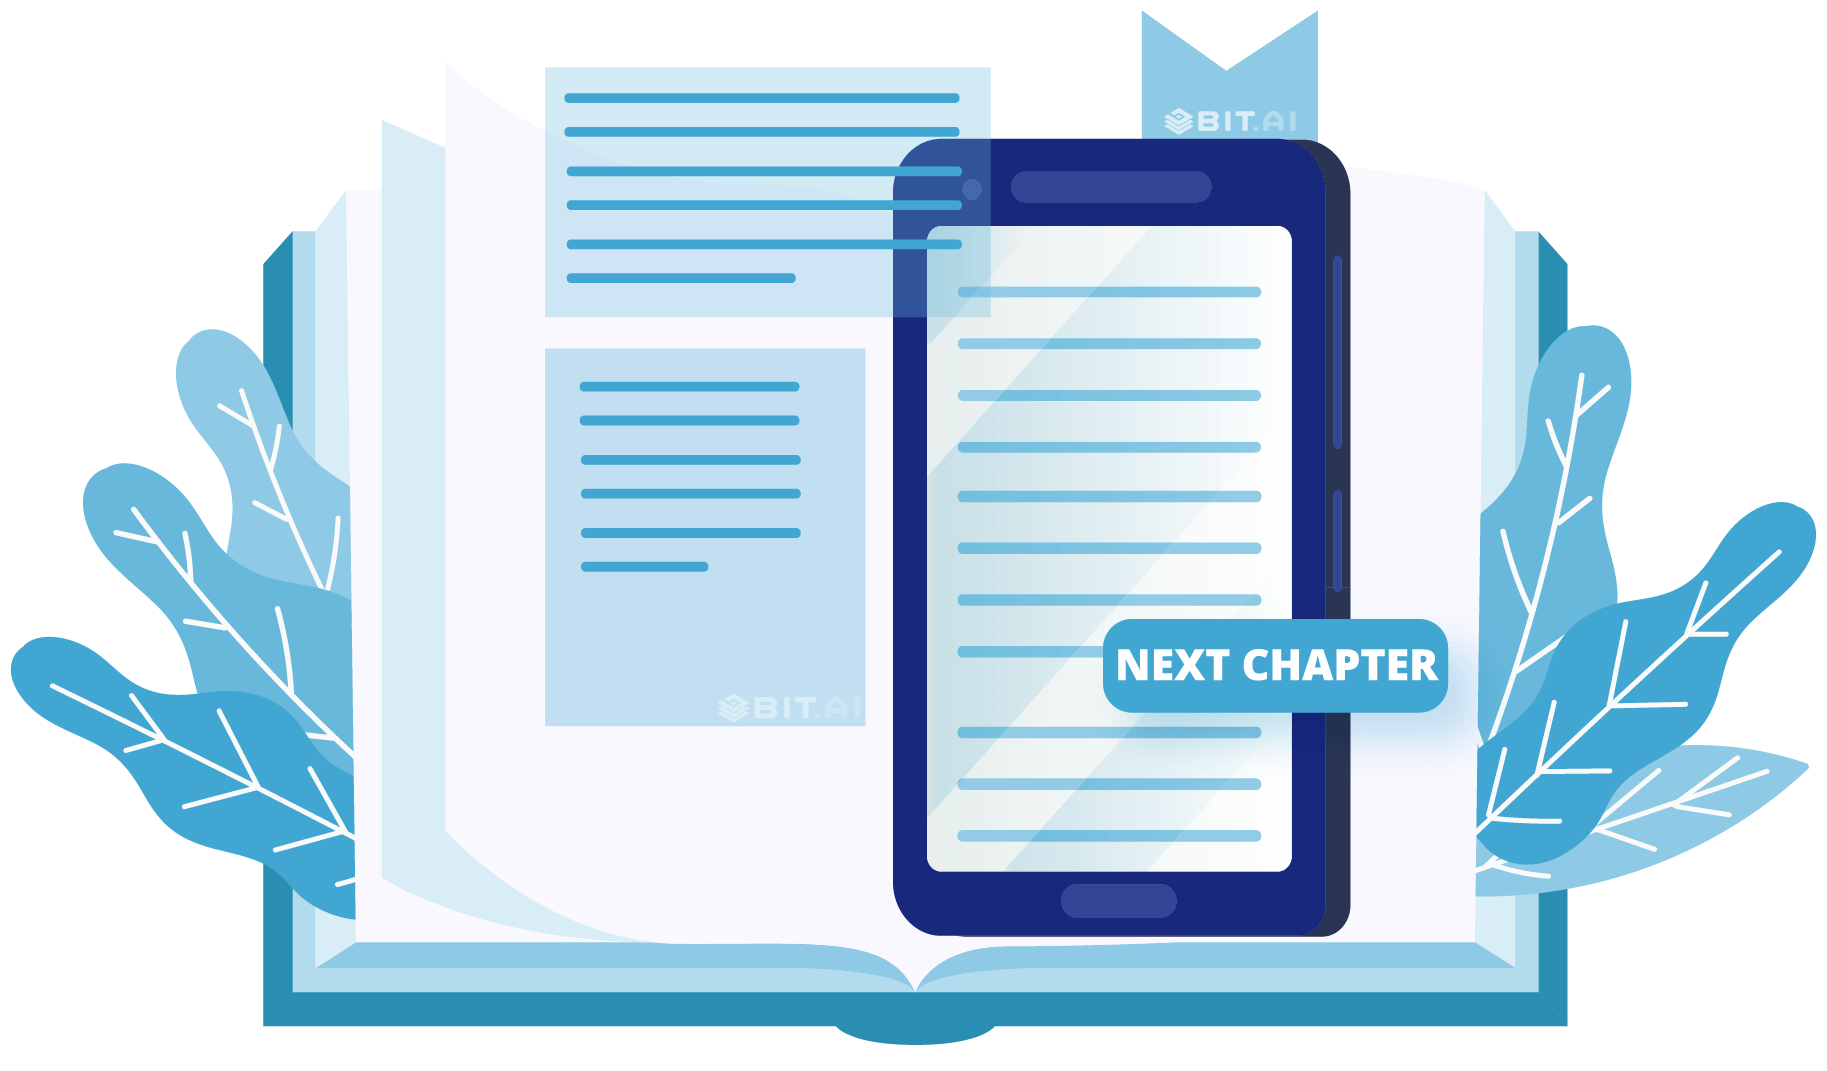 Creating ebooks as an online business idea